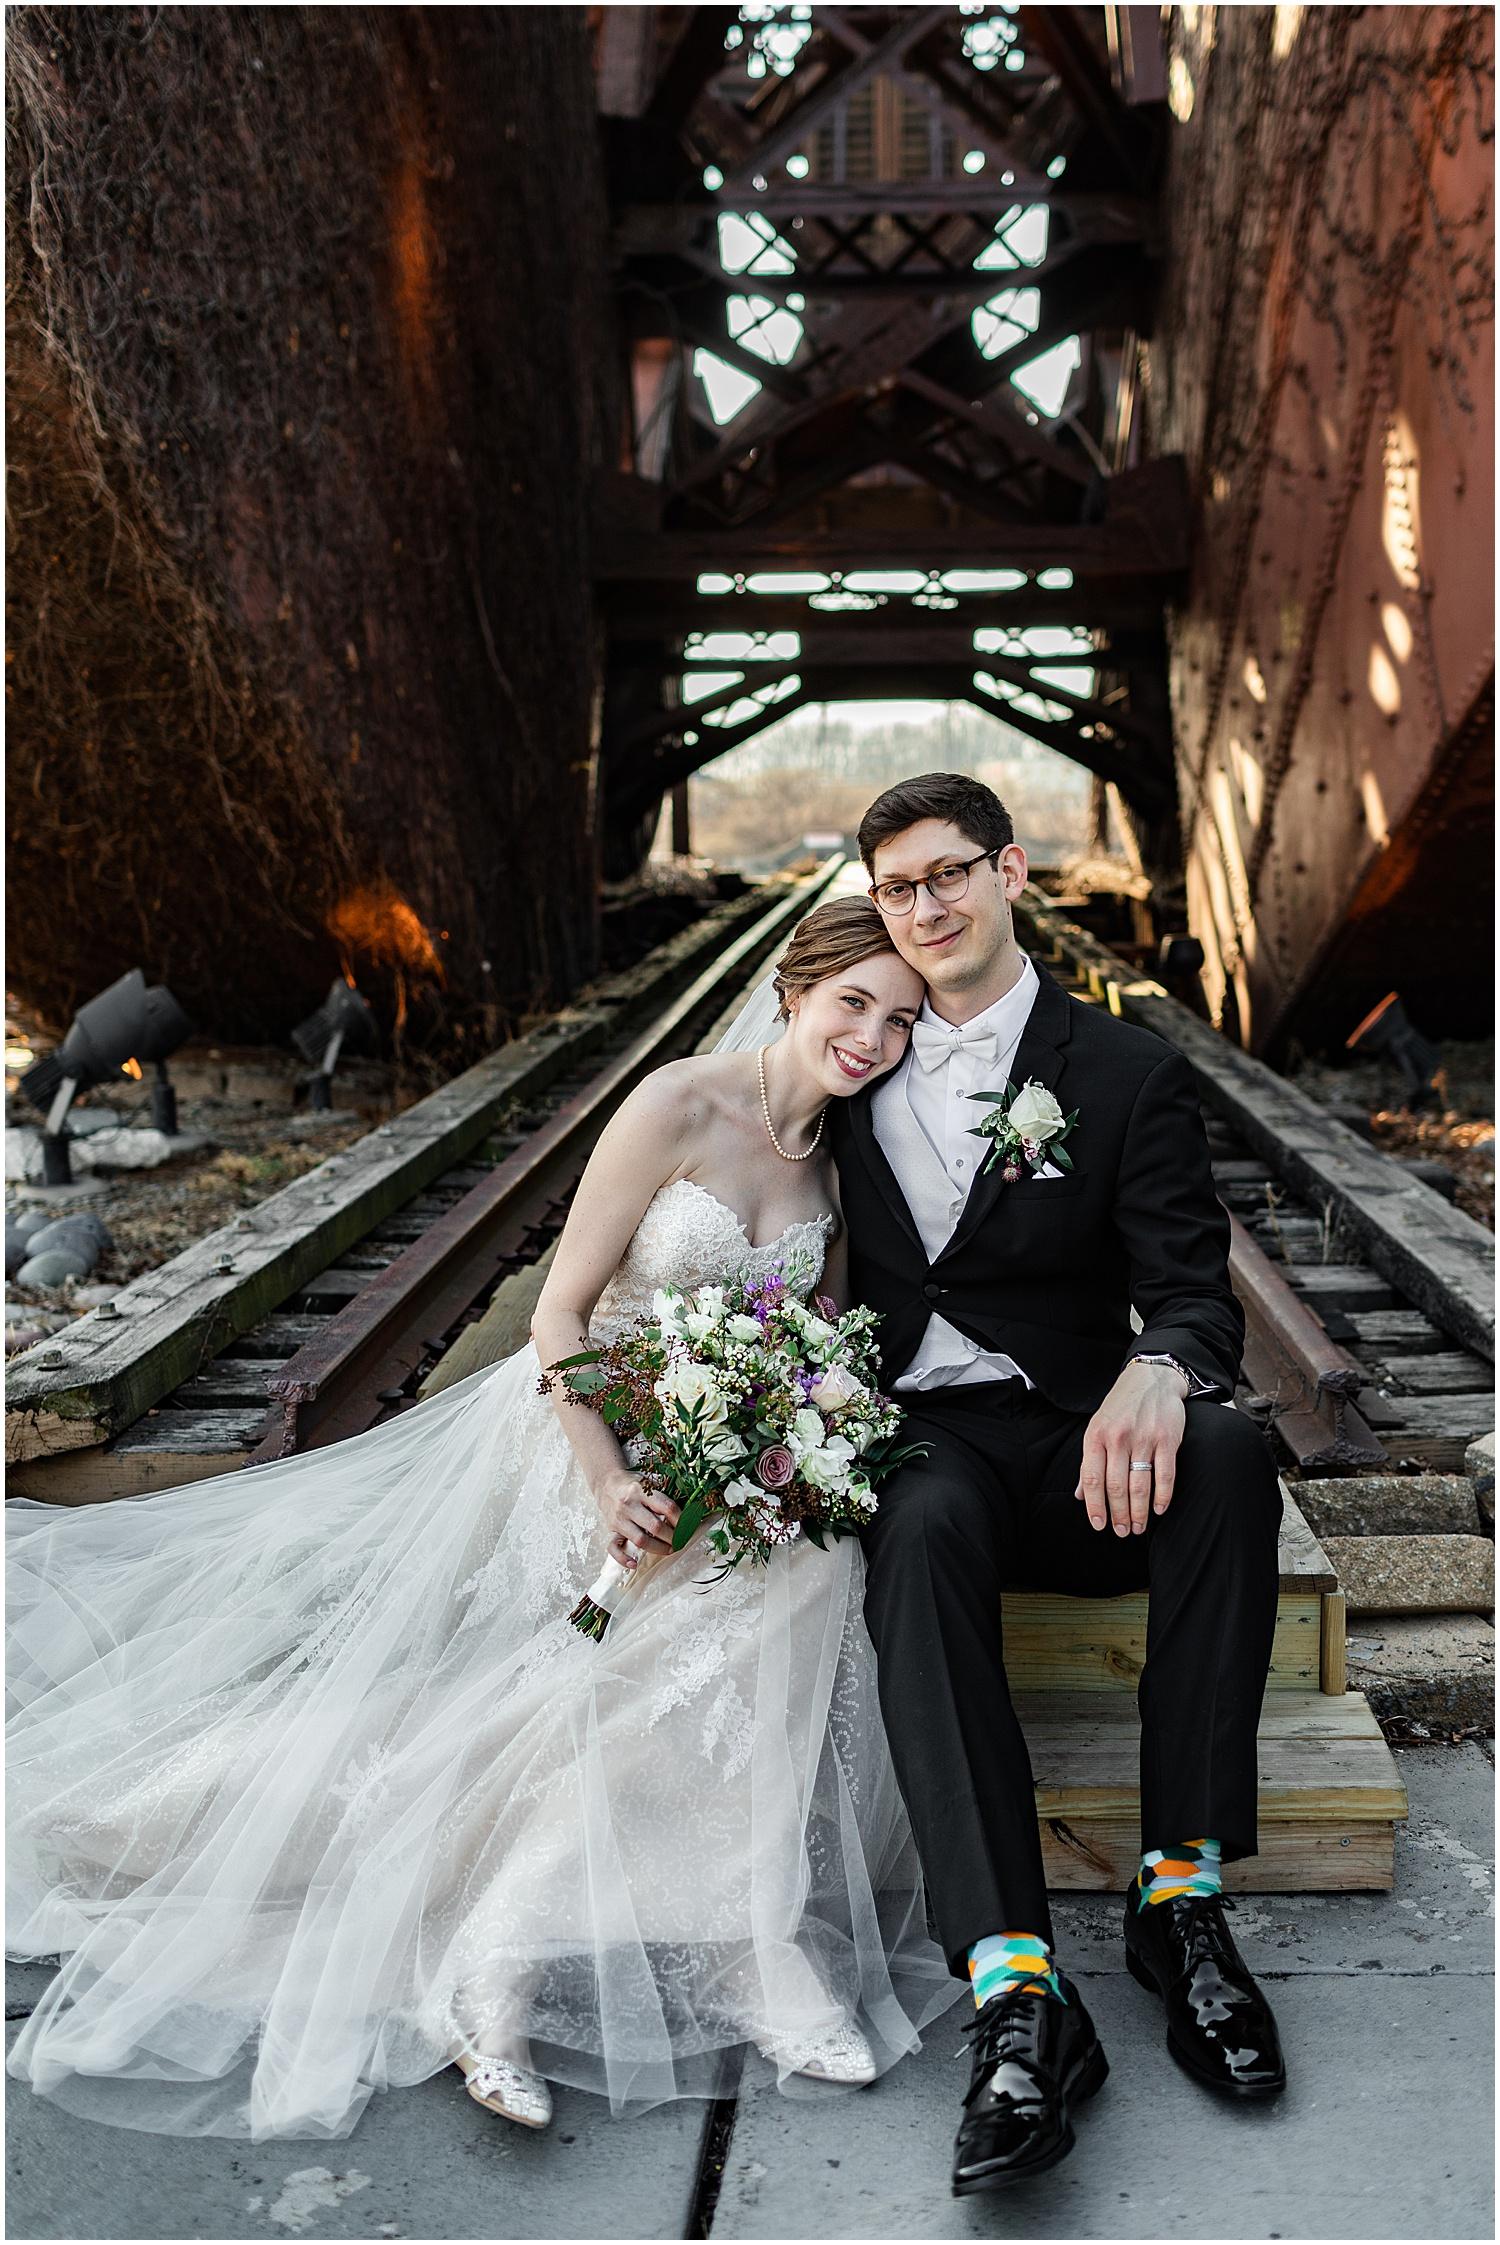 Spring Wedding at Windows on the River, Best Cleveland Wedding Photographer Lindsey Ramdin